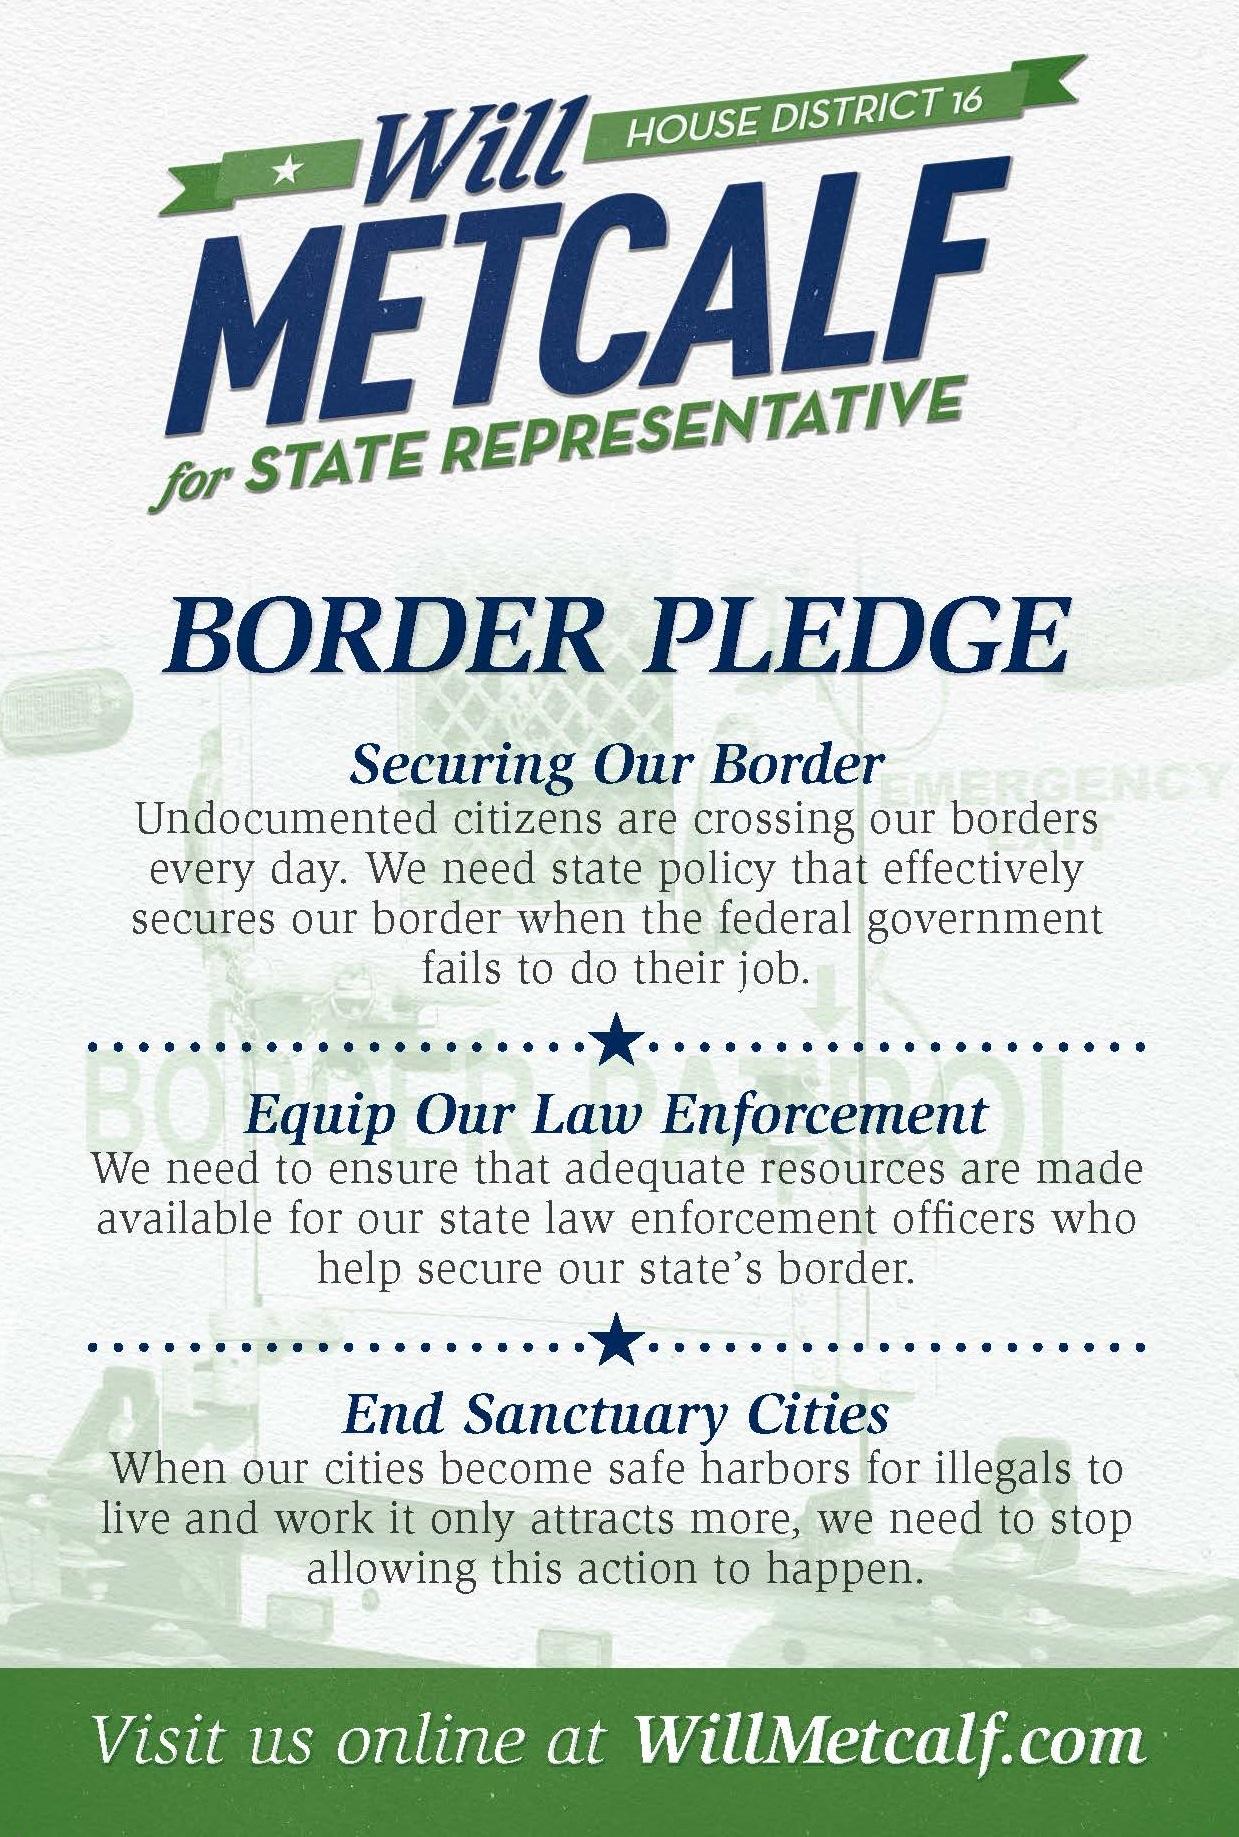 Metcalf_Border_Pledge_Postcard_Page_1.jpg